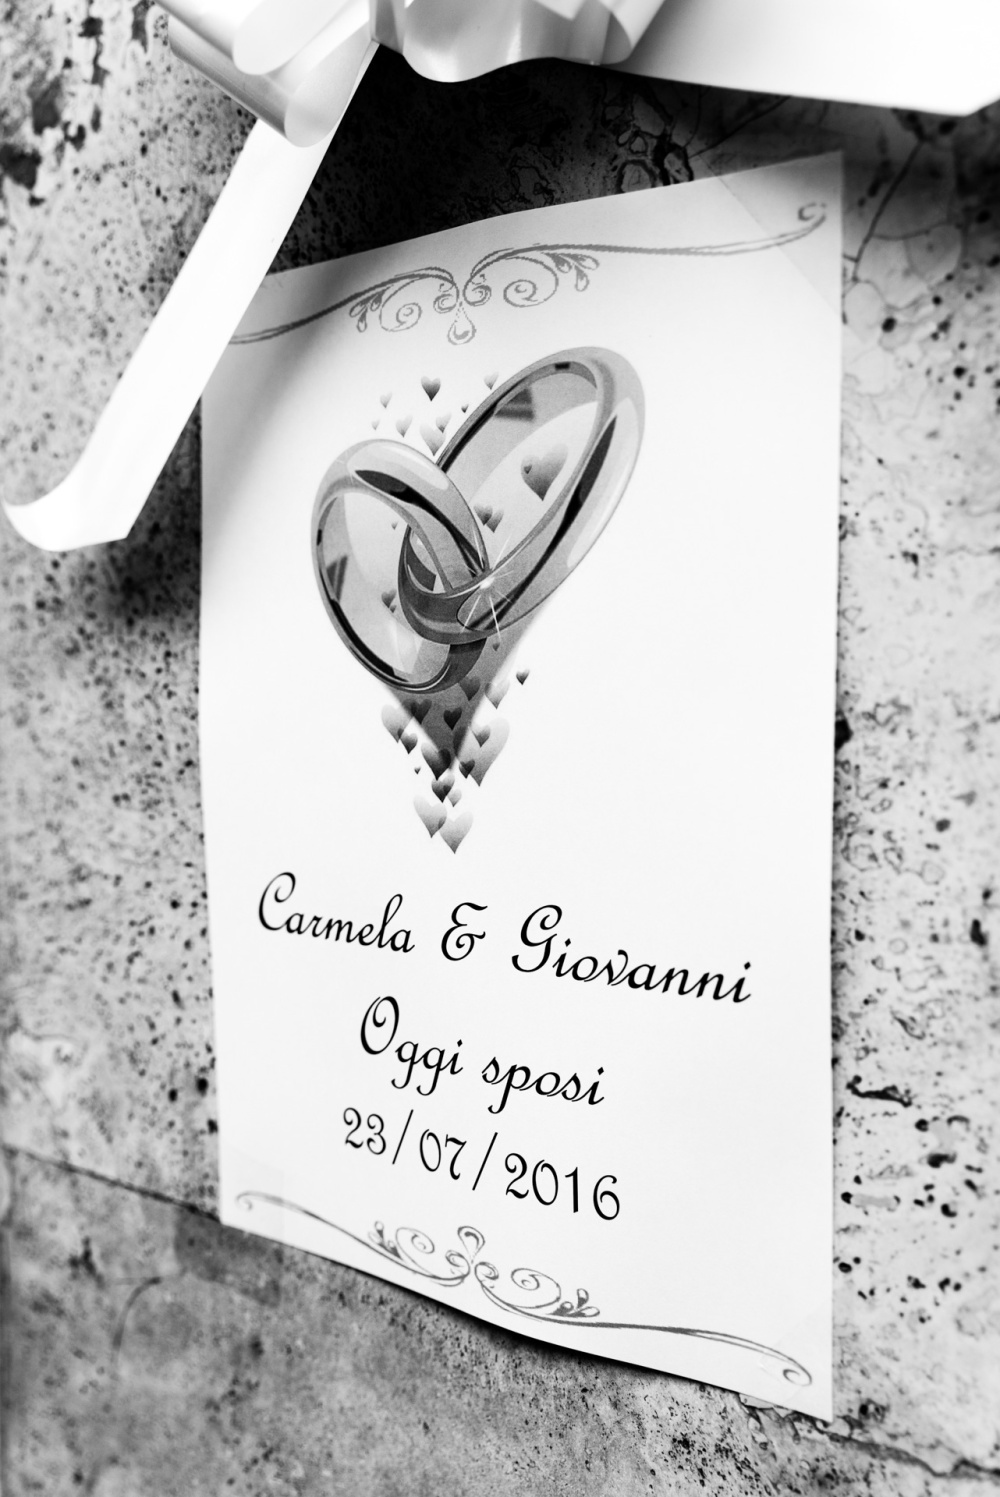 carmela_giovanni-13